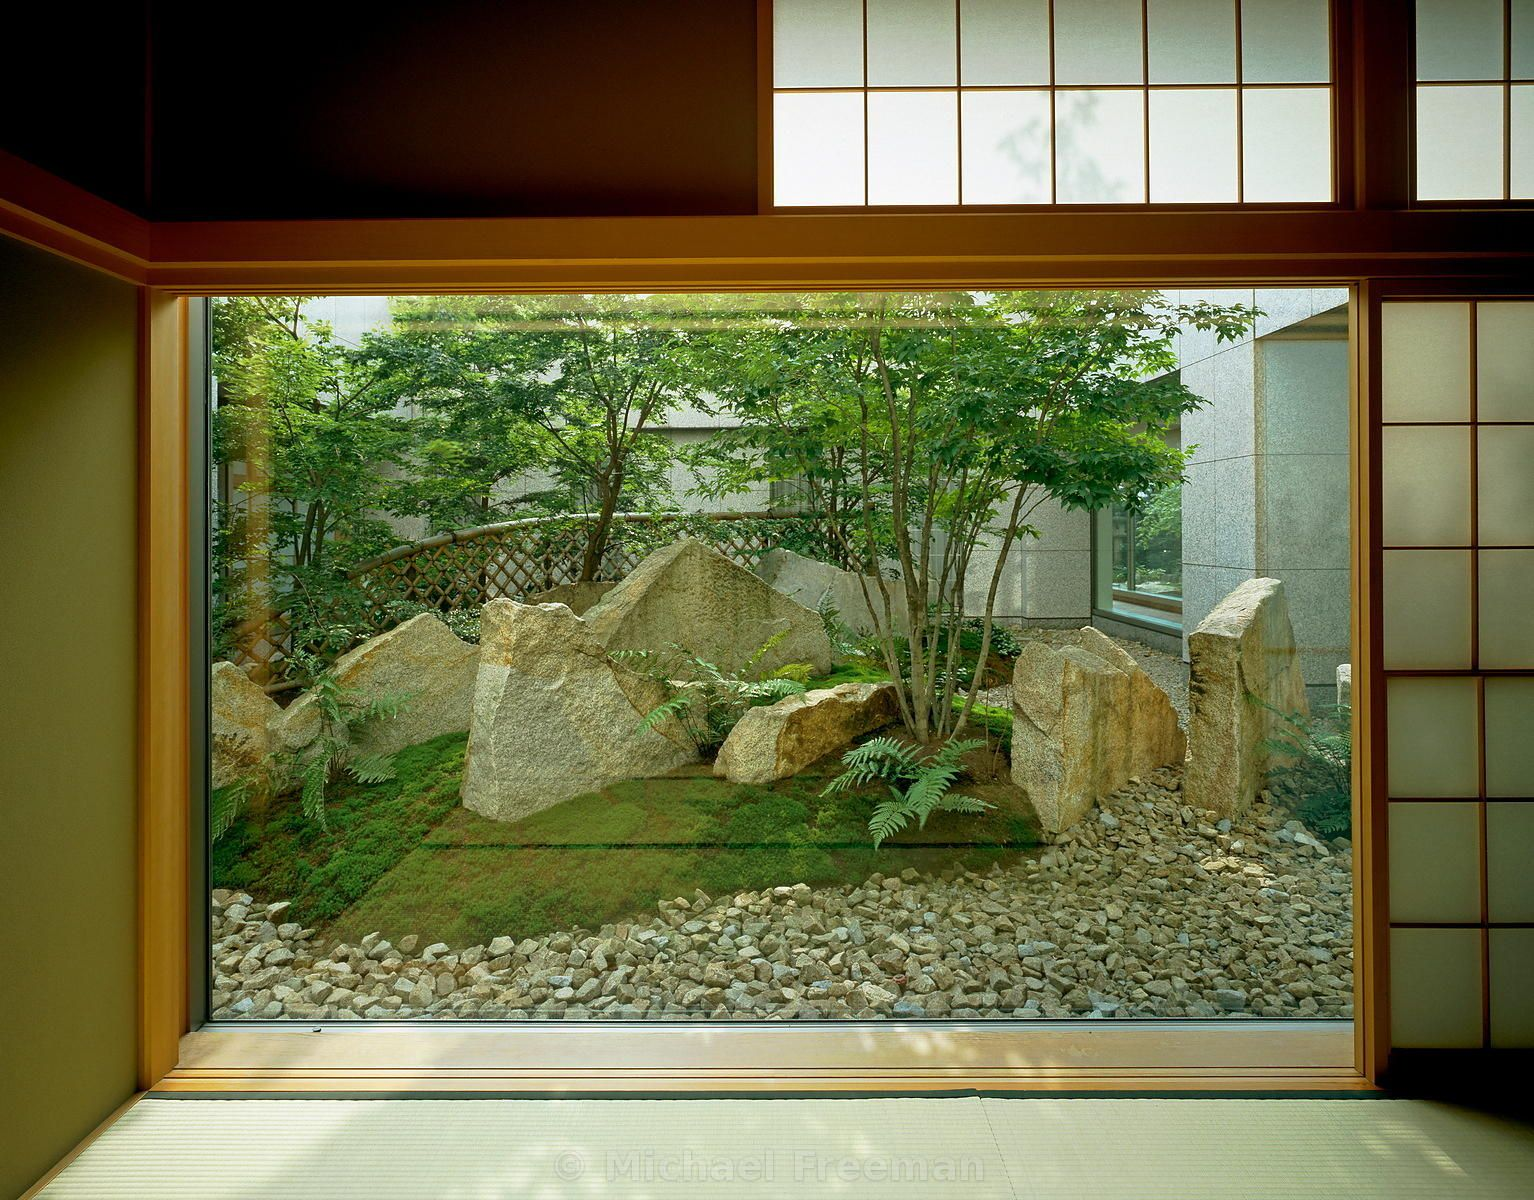 Contemporary Zen Garden At The Kojimachi Kaikan In Tokyo, Japan Designed By  The Zen Priest